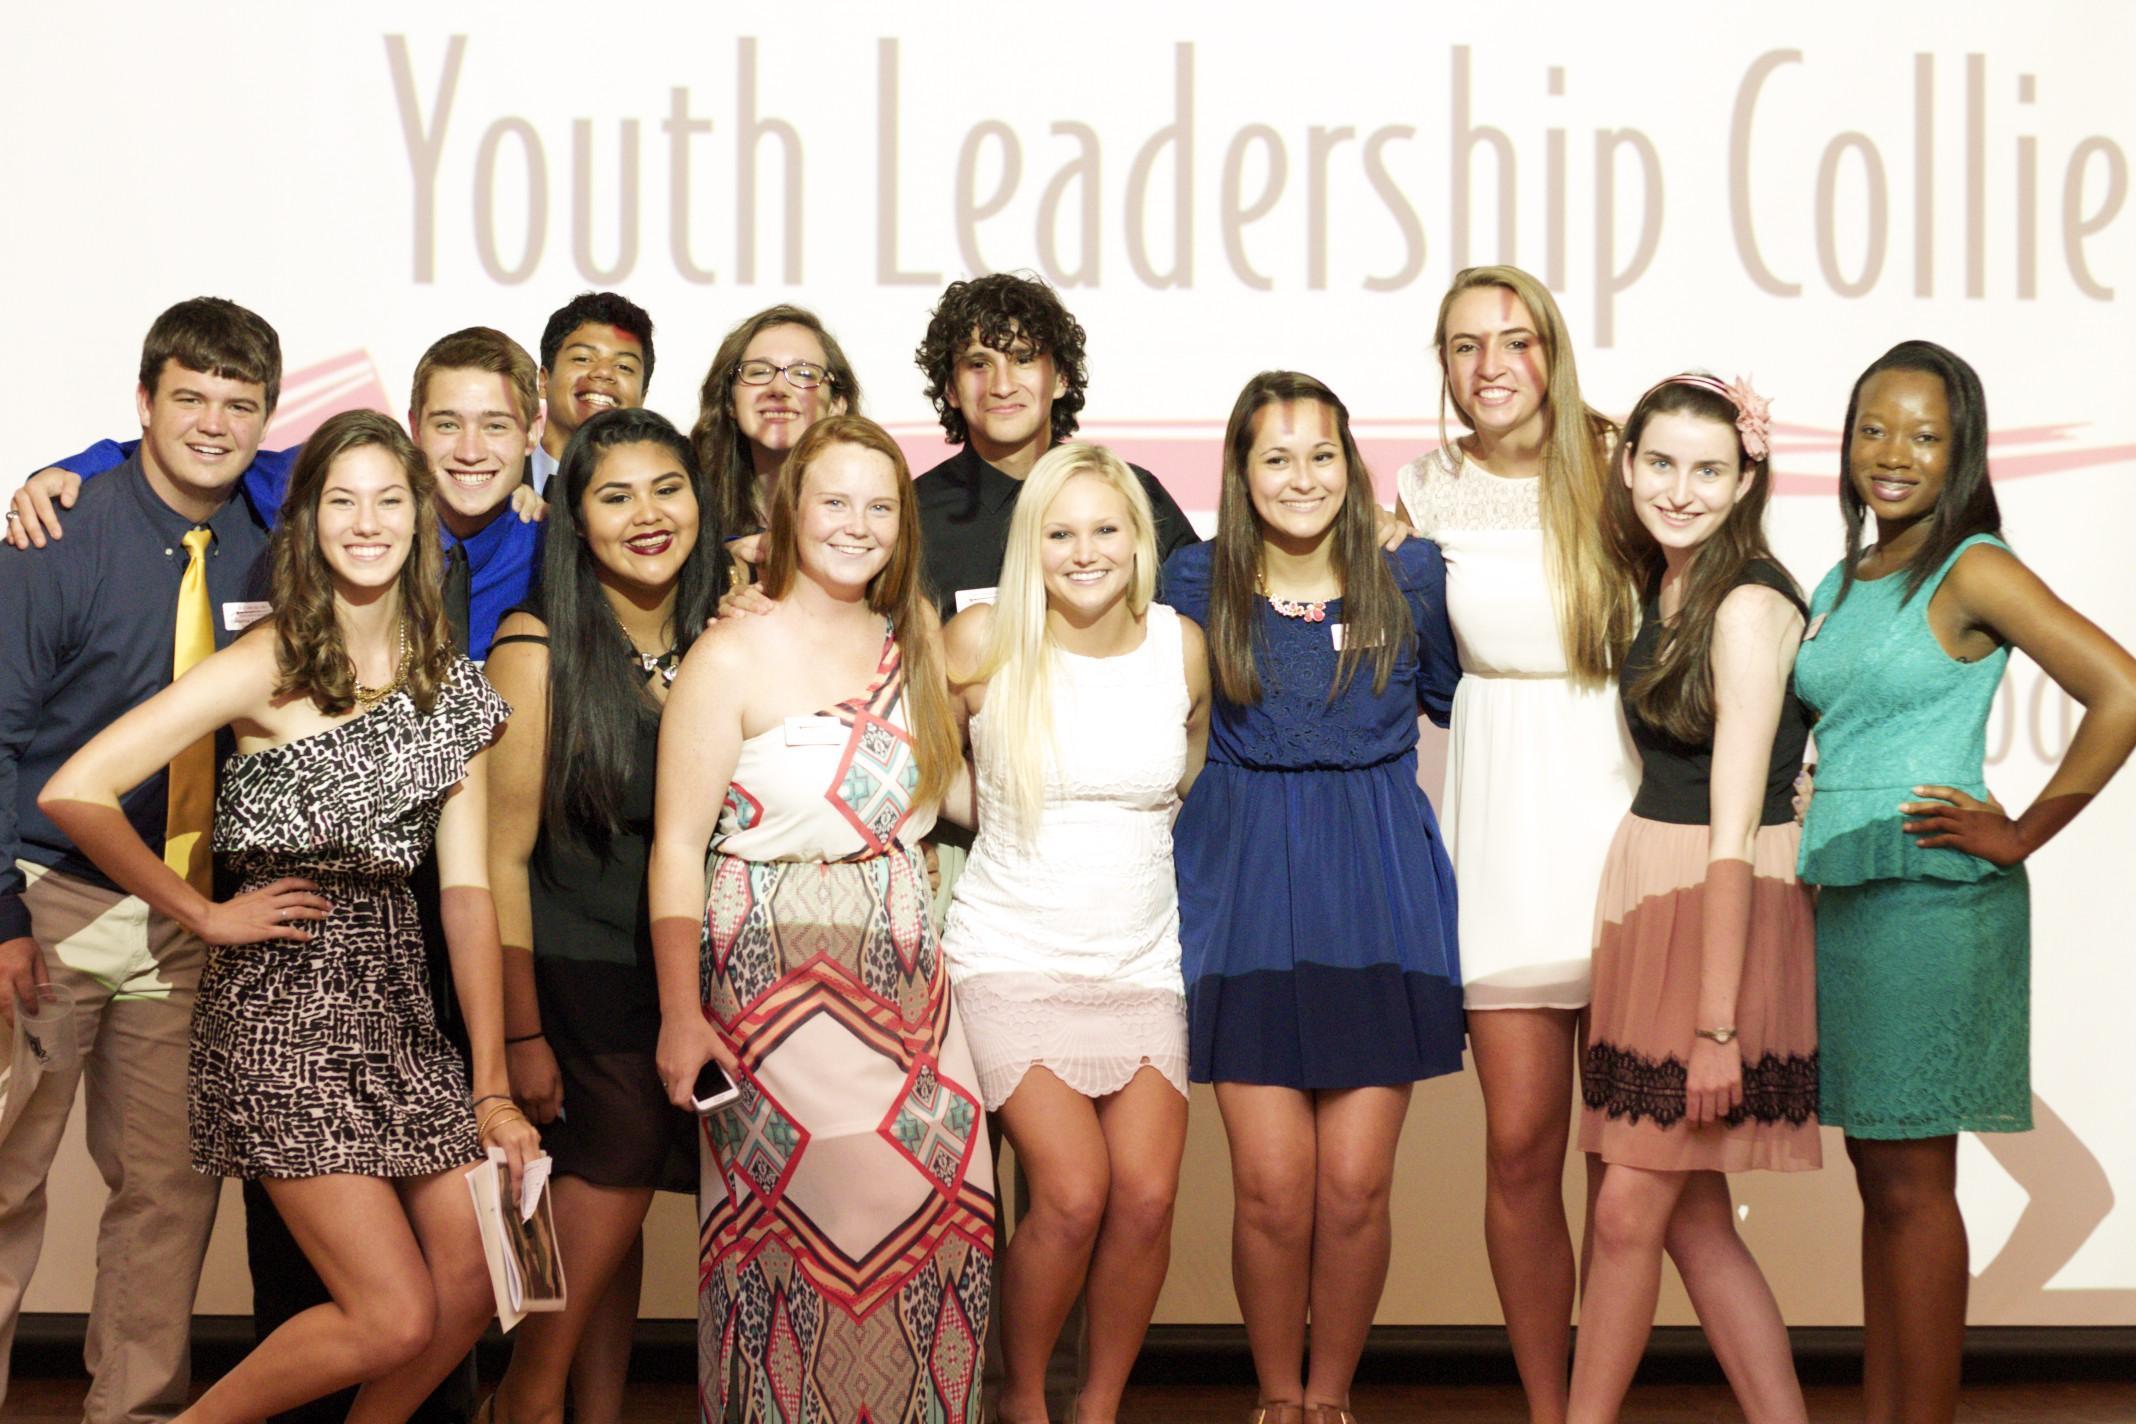 Youth Leadership Collier Graduation 2014